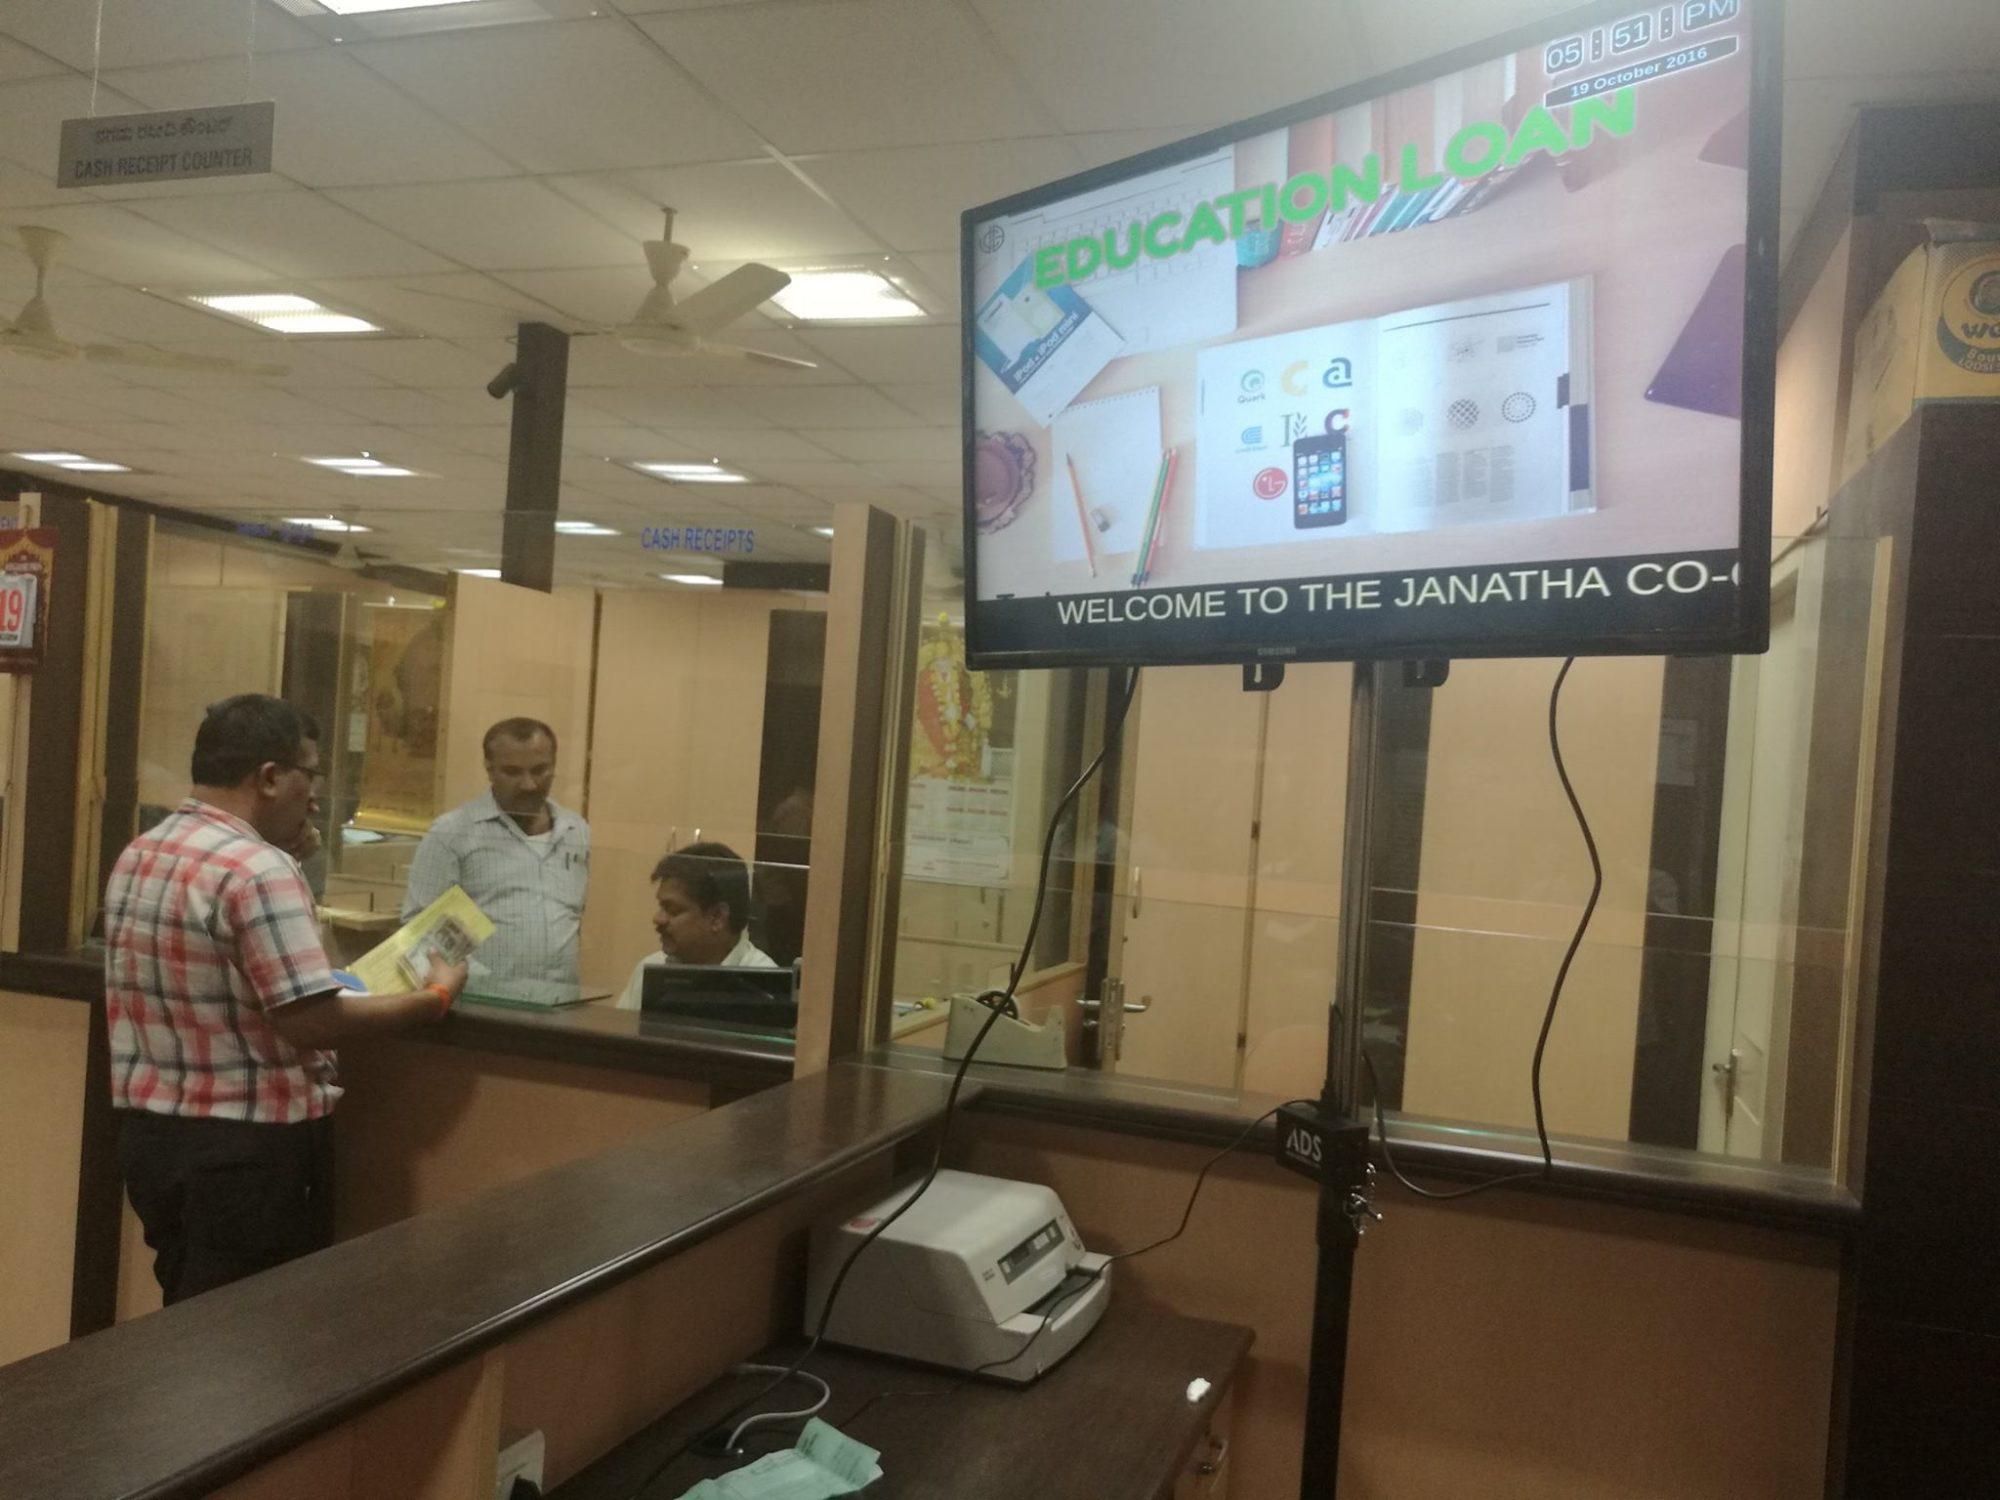 The Janatha Co-operative Bank